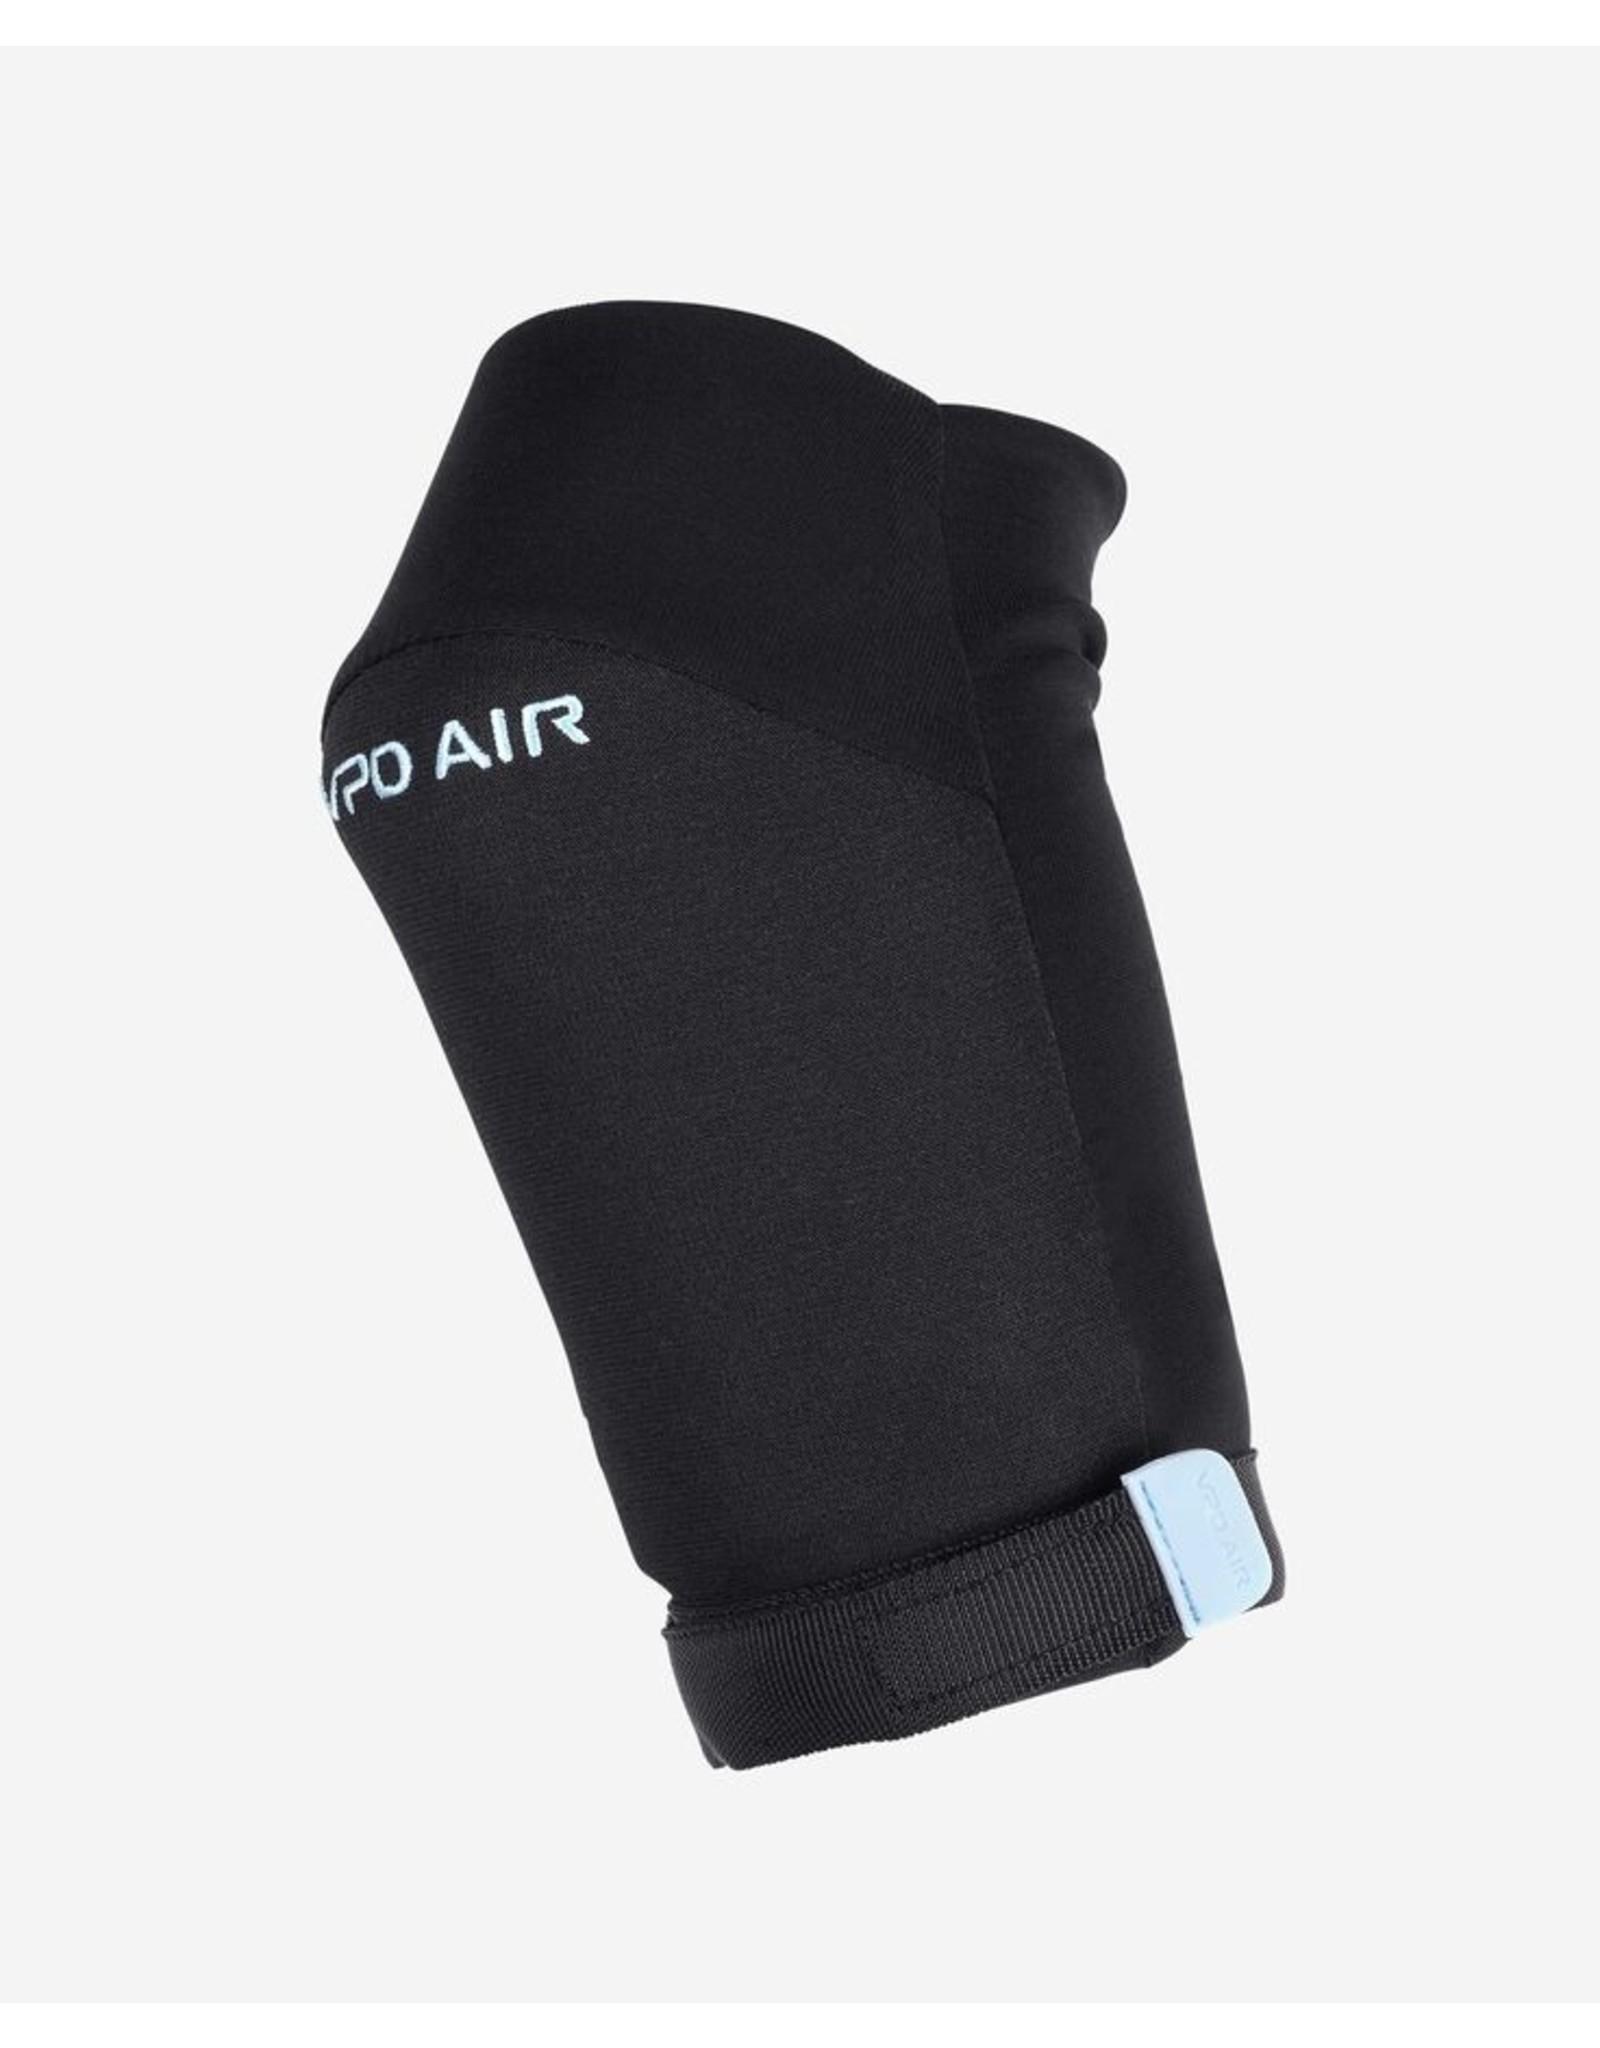 POC Joint VPD Air Elbow